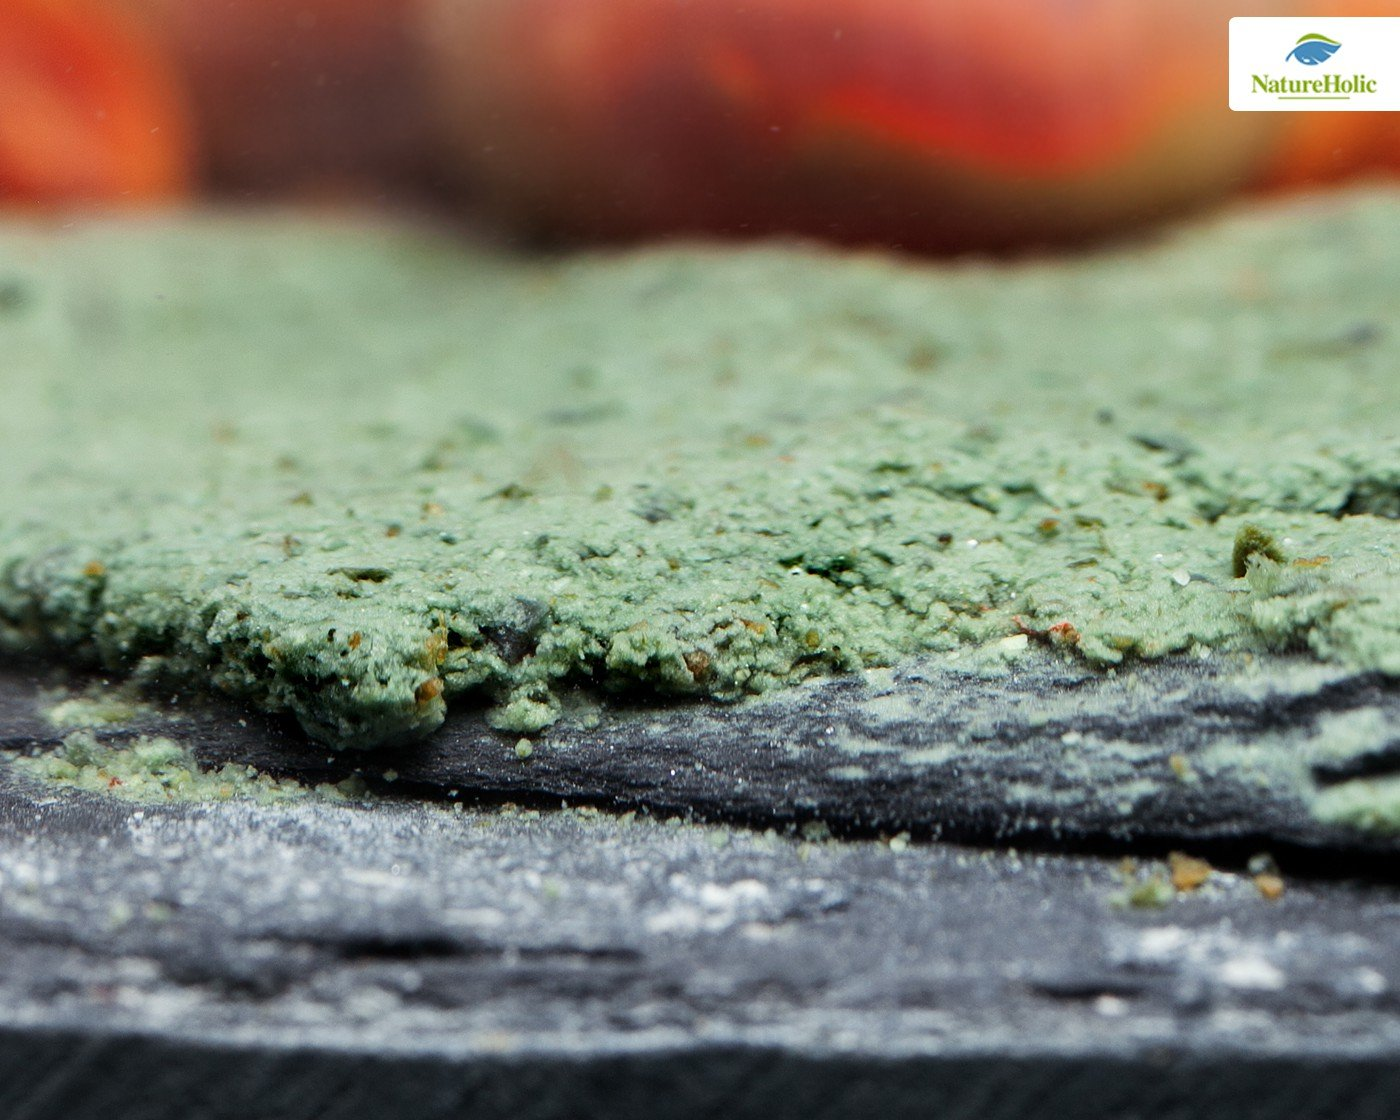 natural eholic Caracol Feed Power de pasta - 30 G - para caracoles en acuario: Amazon.es: Productos para mascotas